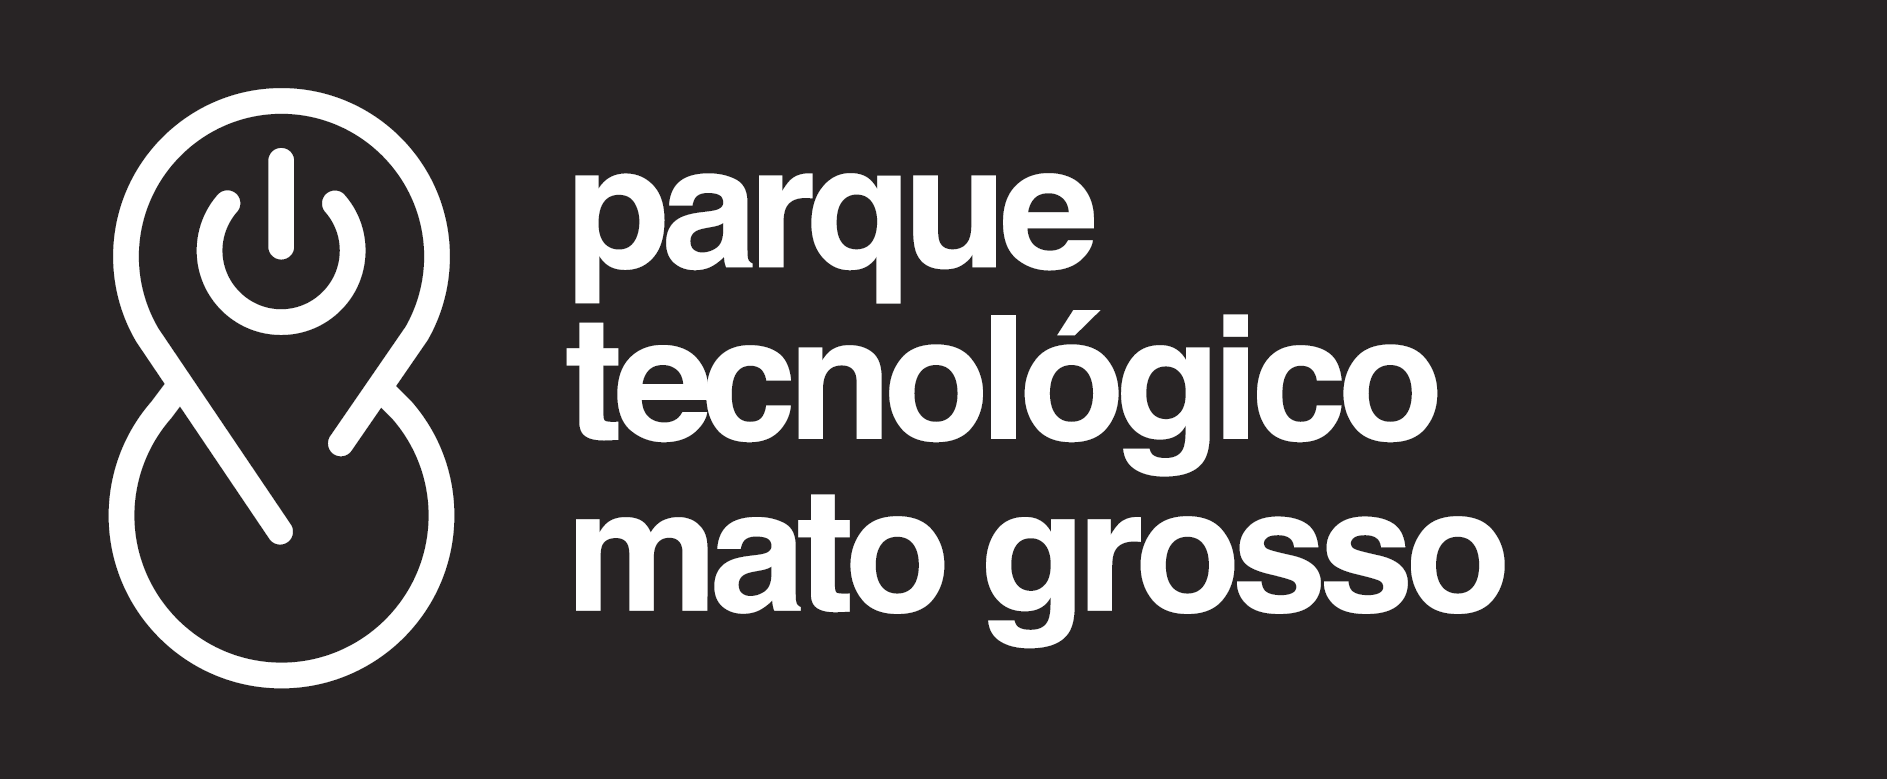 https://www.redeinovamt.com.br/wp-content/uploads/2020/11/Logo-Parque.png